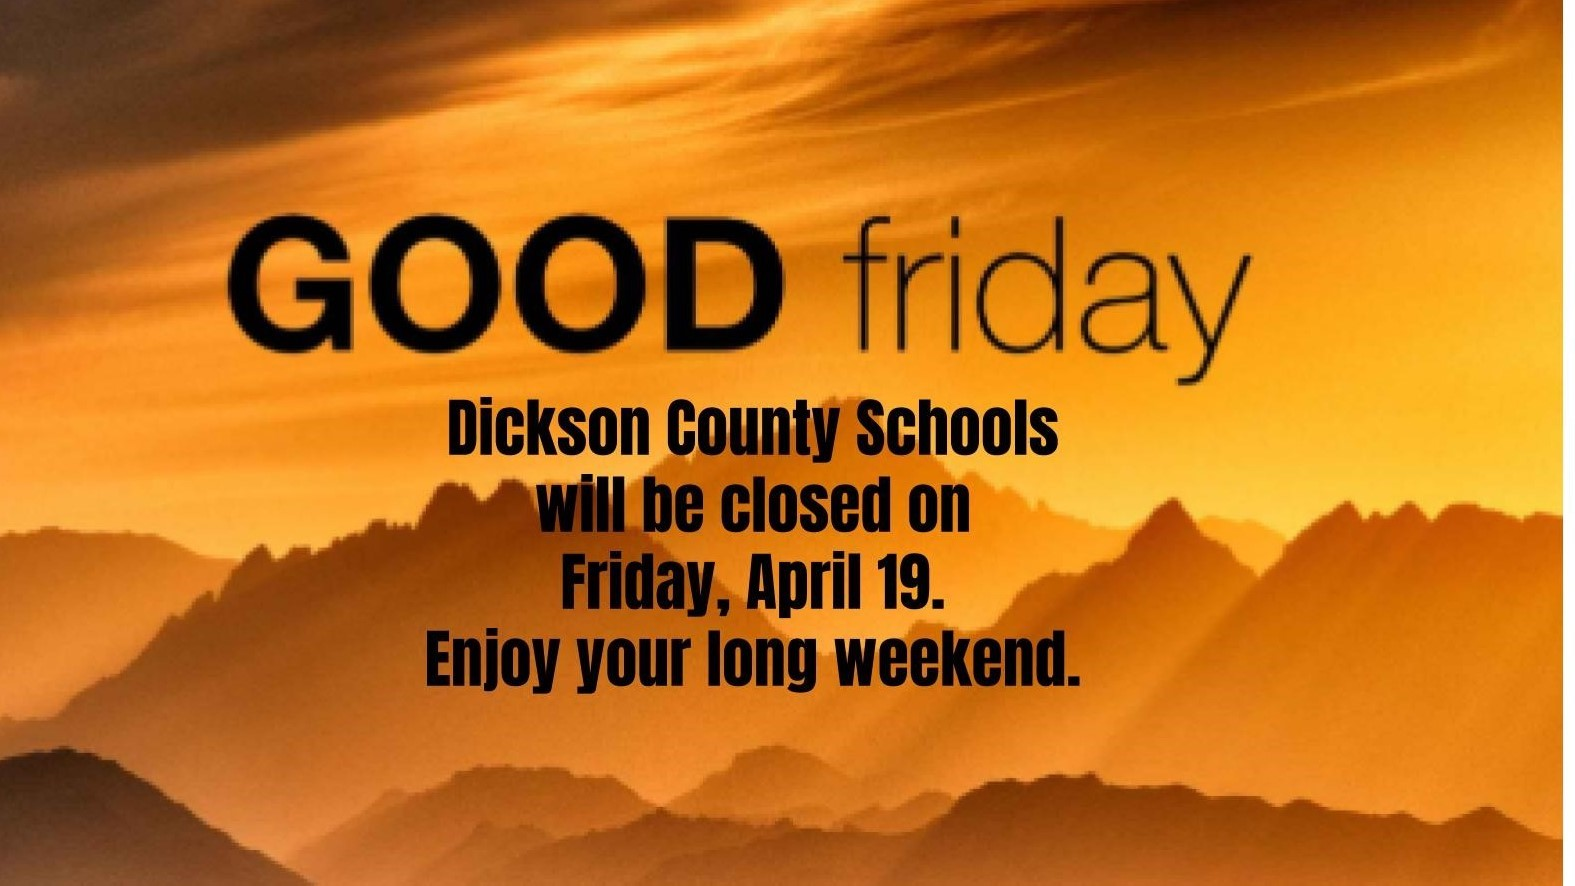 good friday: no school